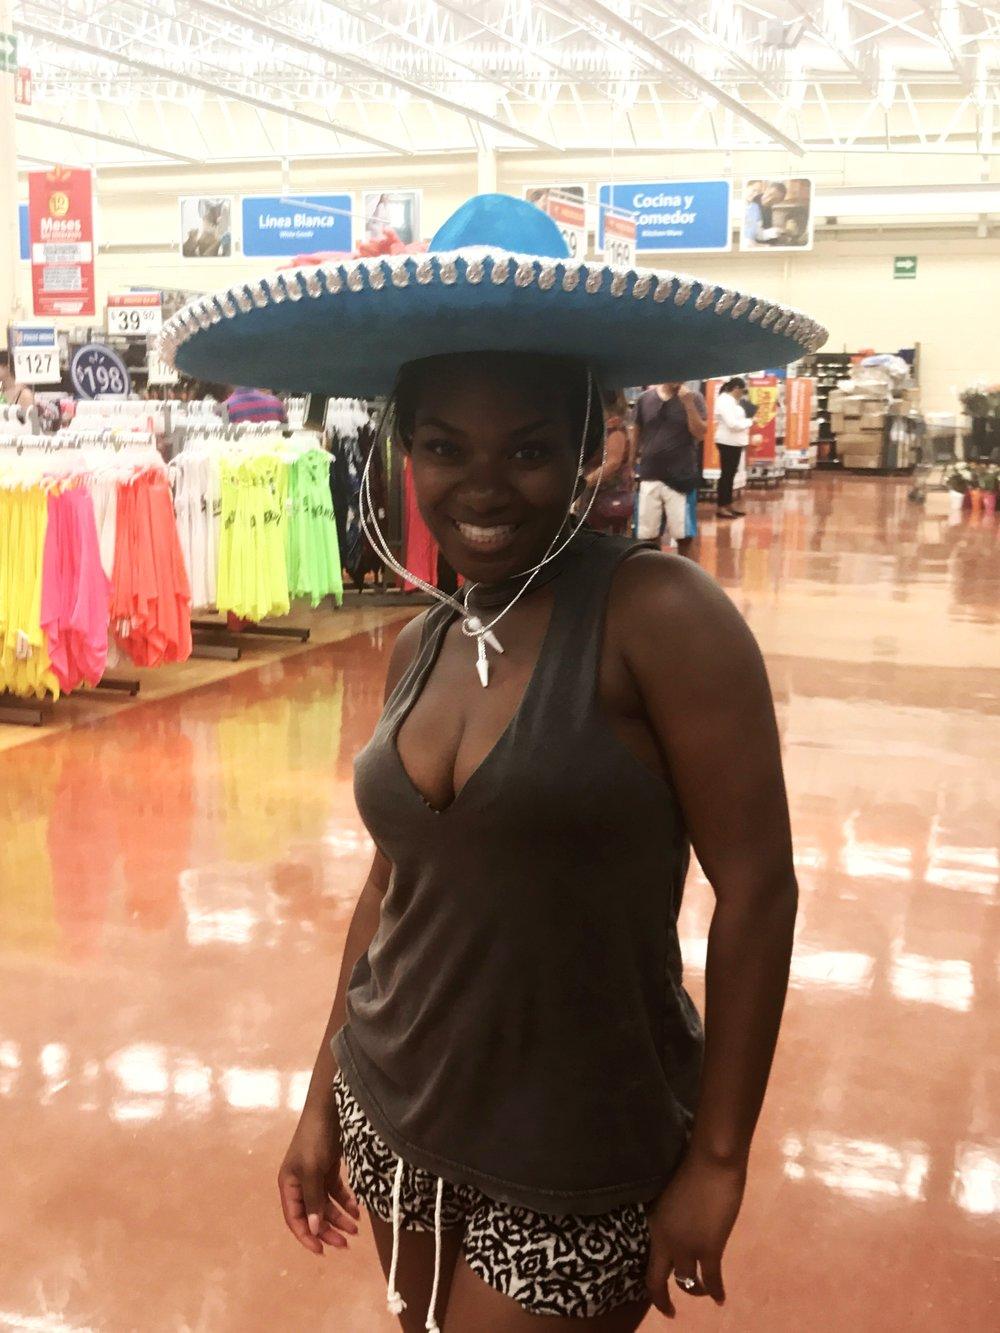 Black Destination Bride - BlackDesti Wedding Countdown Journal - Bridefriends Podcast - 3 Playa del Carmen Mexico - Walmart3.JPG